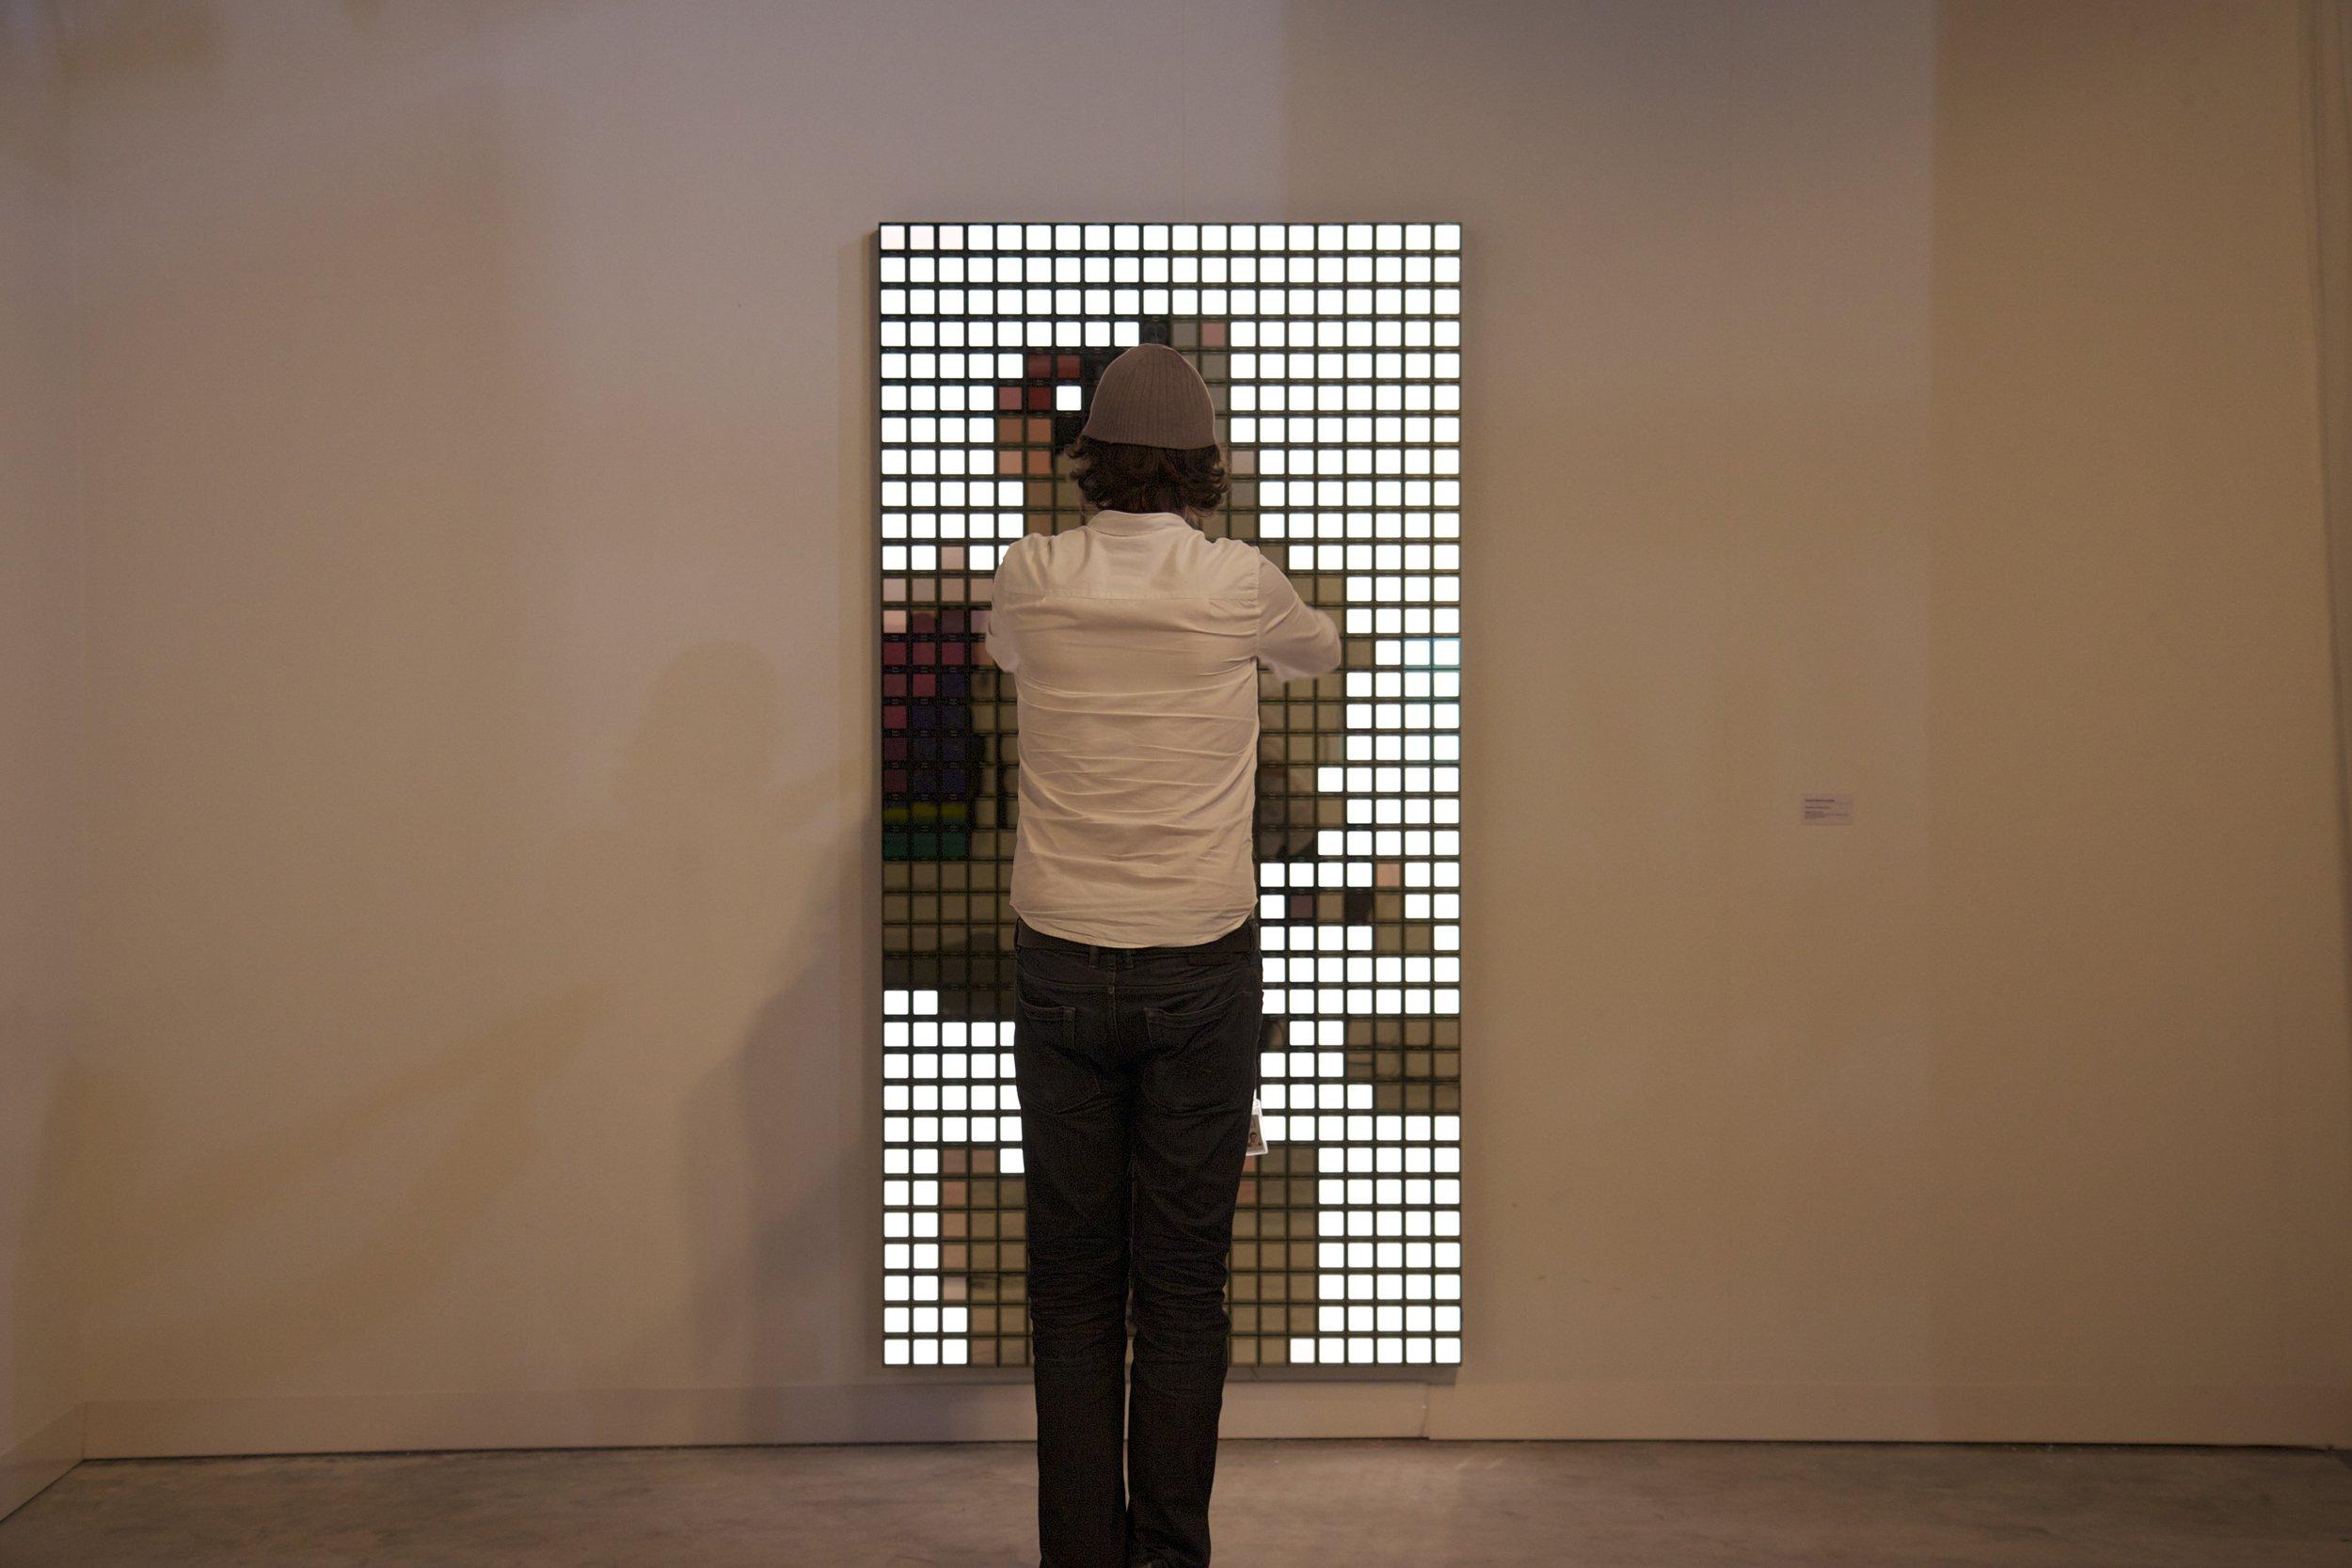 RANDOM INTERNATIONAL, Study of You, 2011